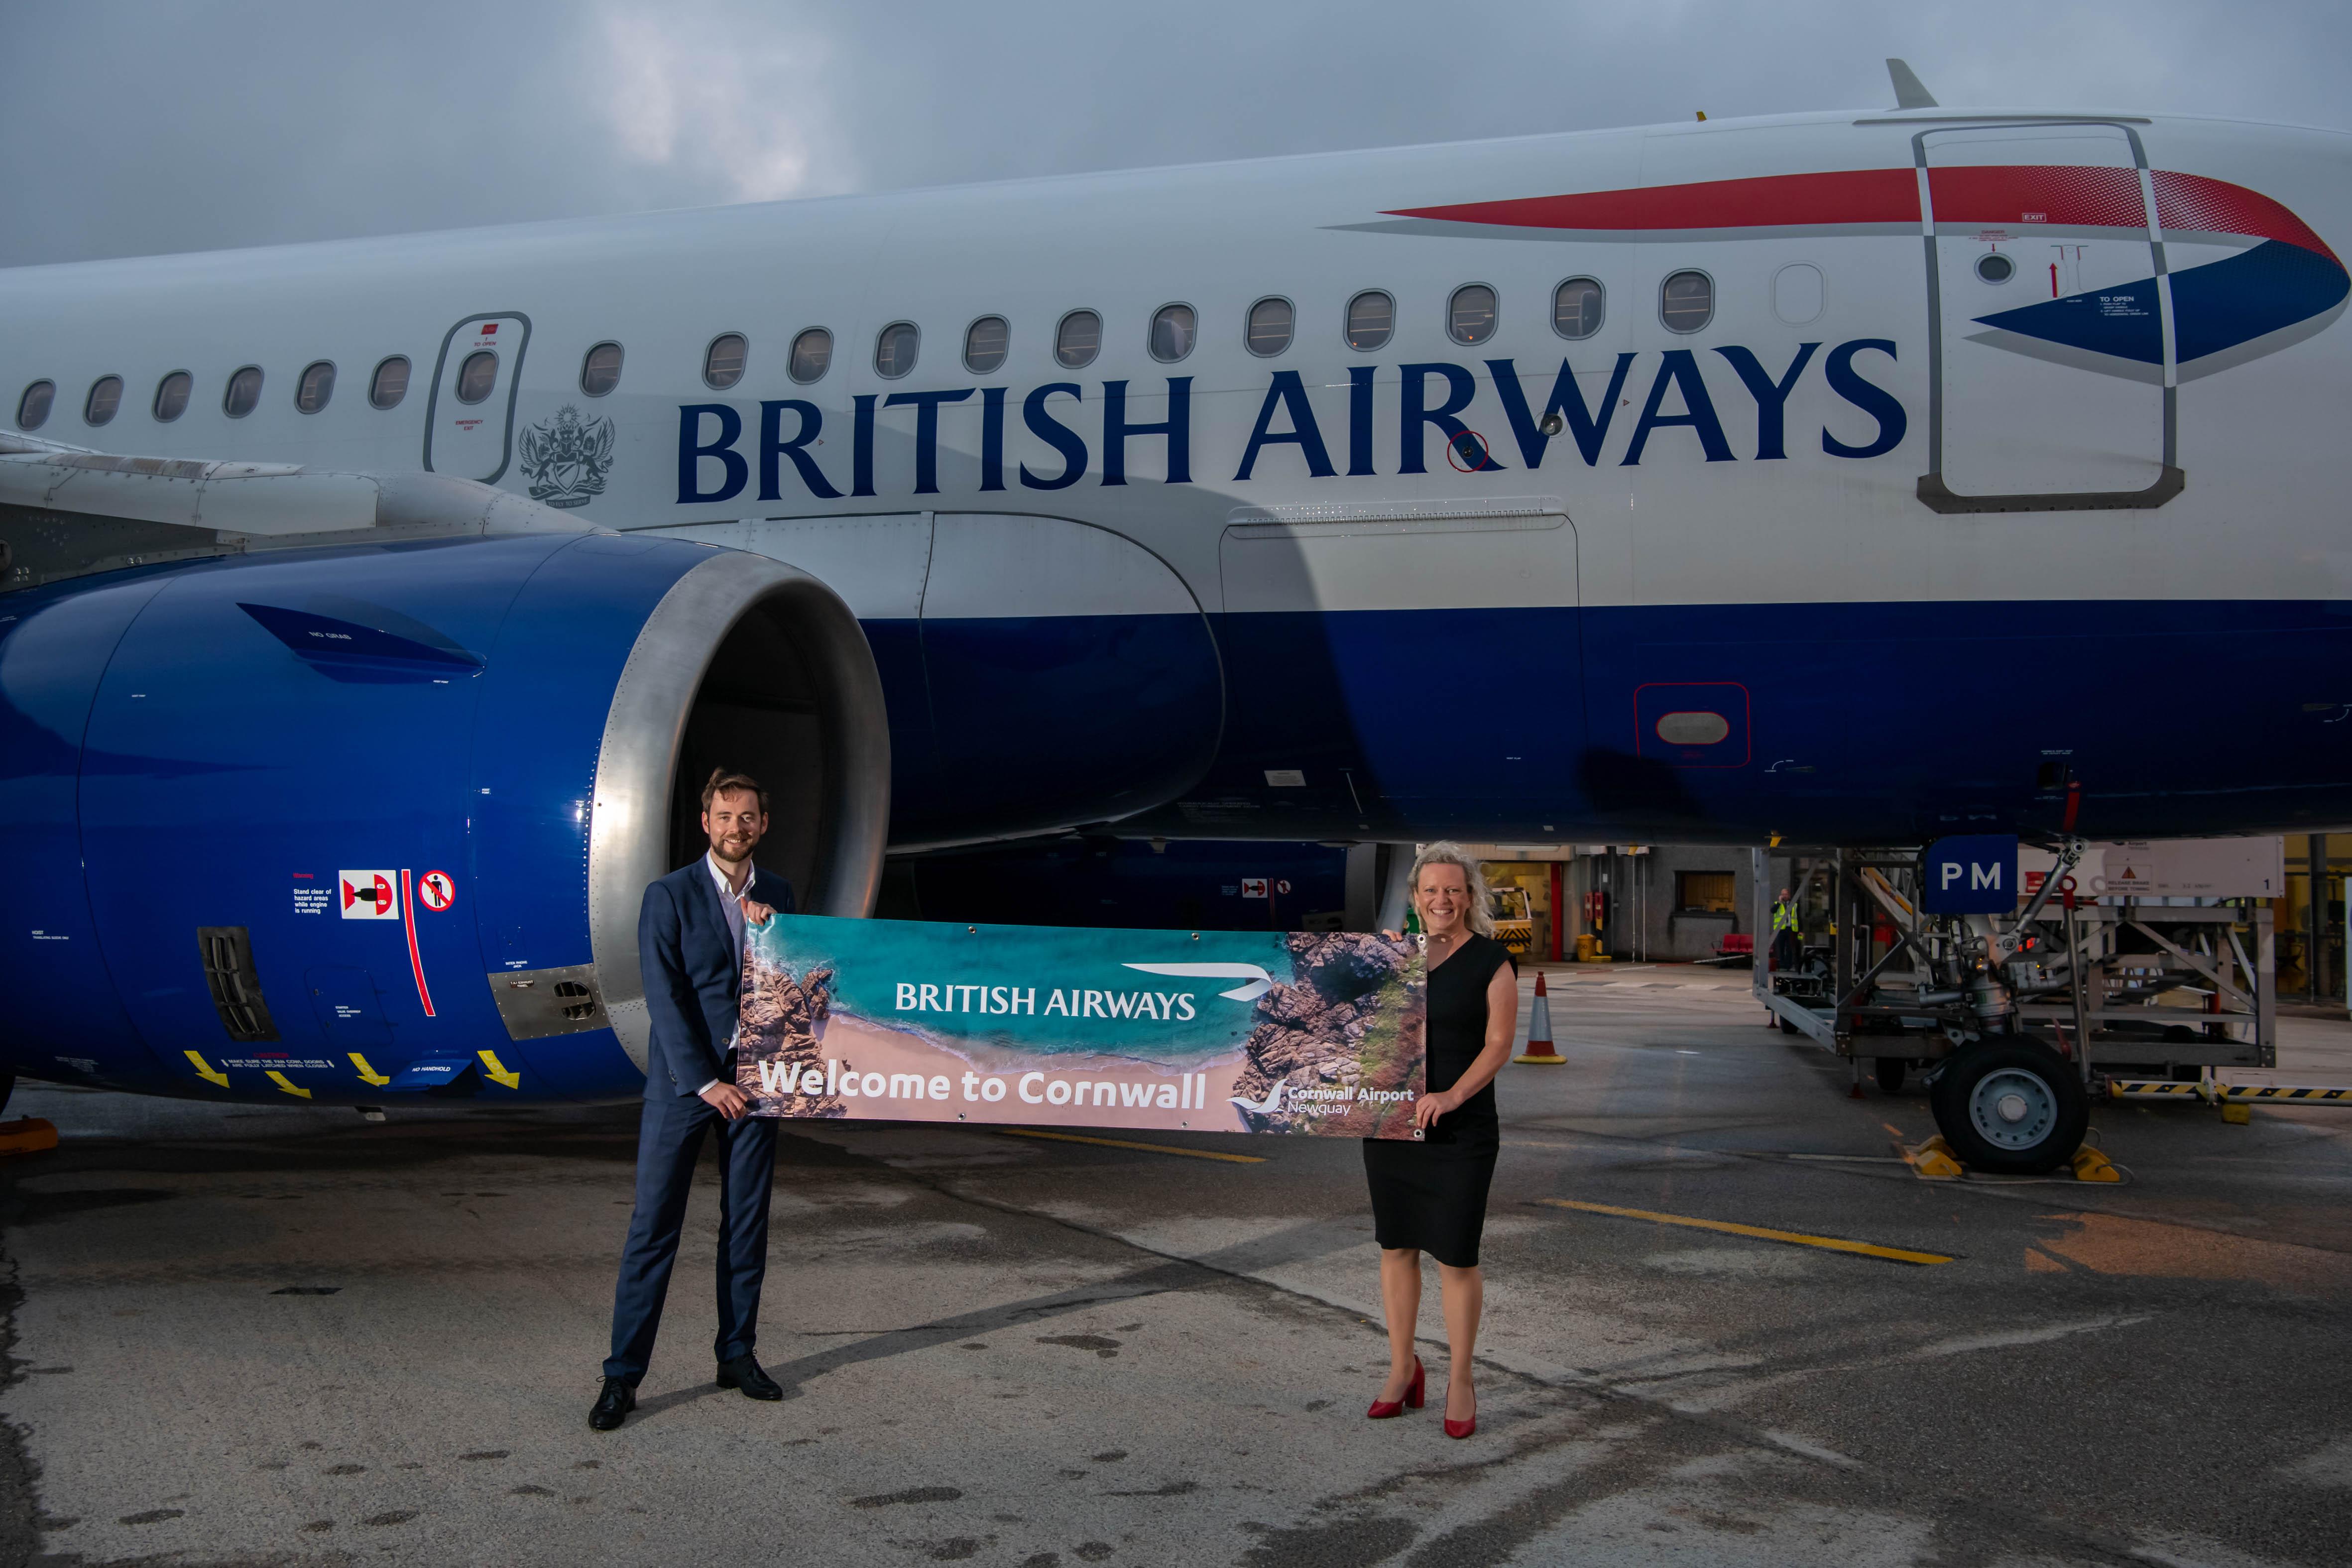 British Airways to make Cornwall-Heathrow link even more successful